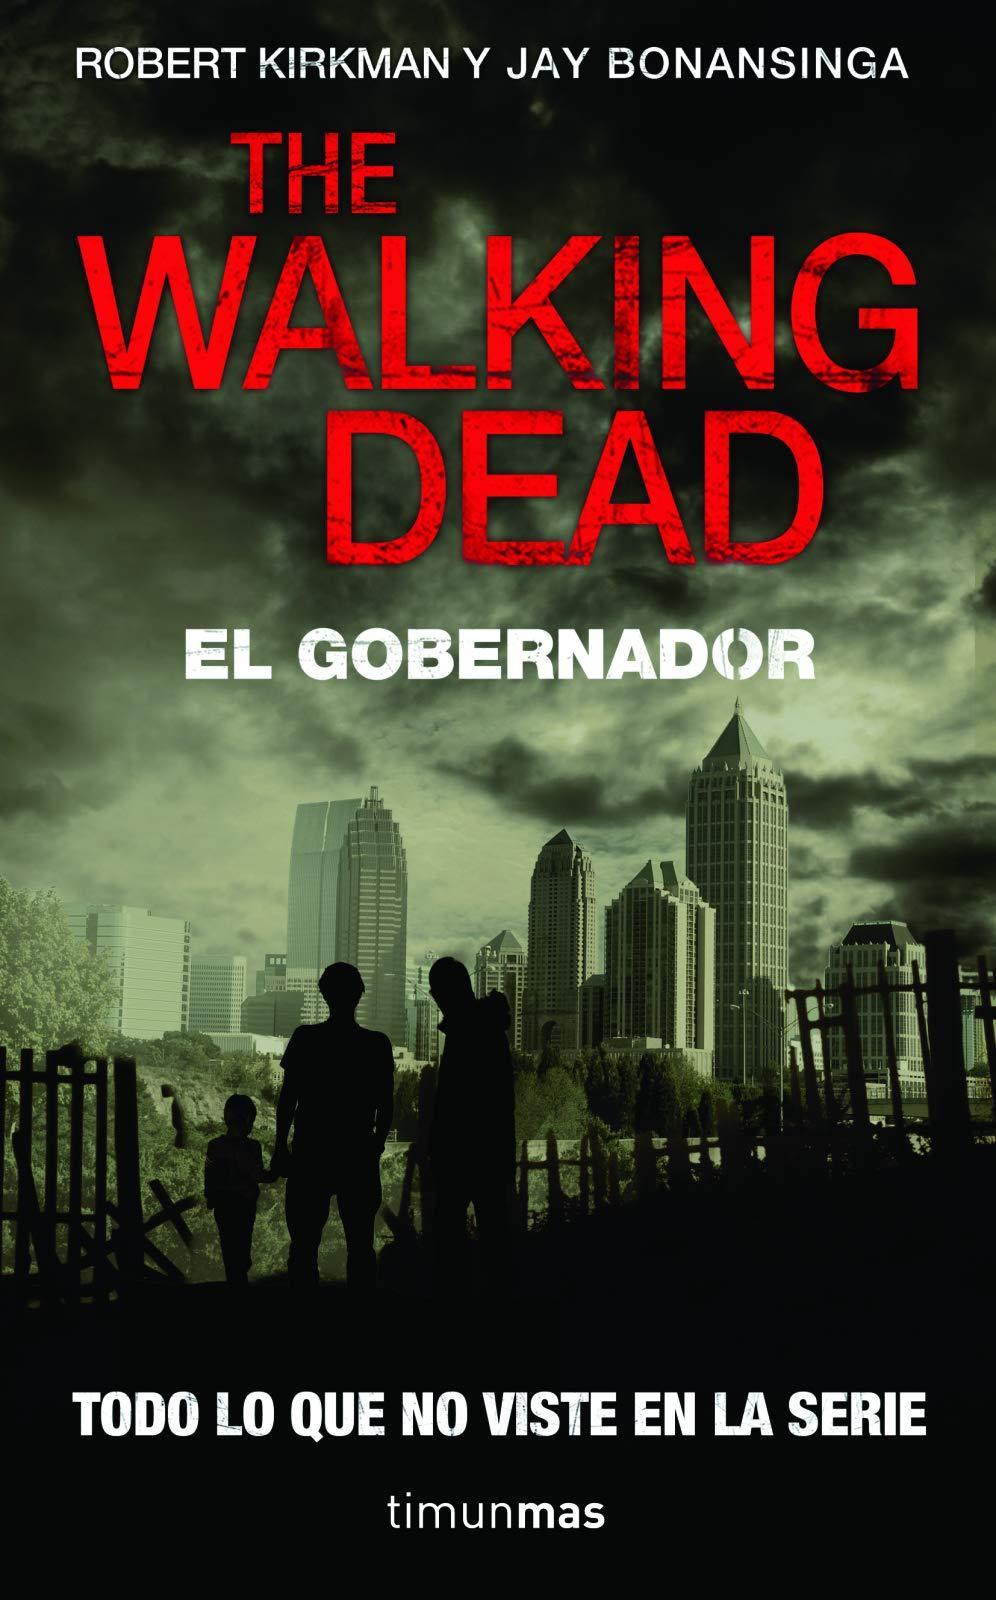 The Walking Dead El Gobernador Walking Dead The Governor Spanish Edition 9786070714788 Kirkman Robert Bonansinga Jay Books